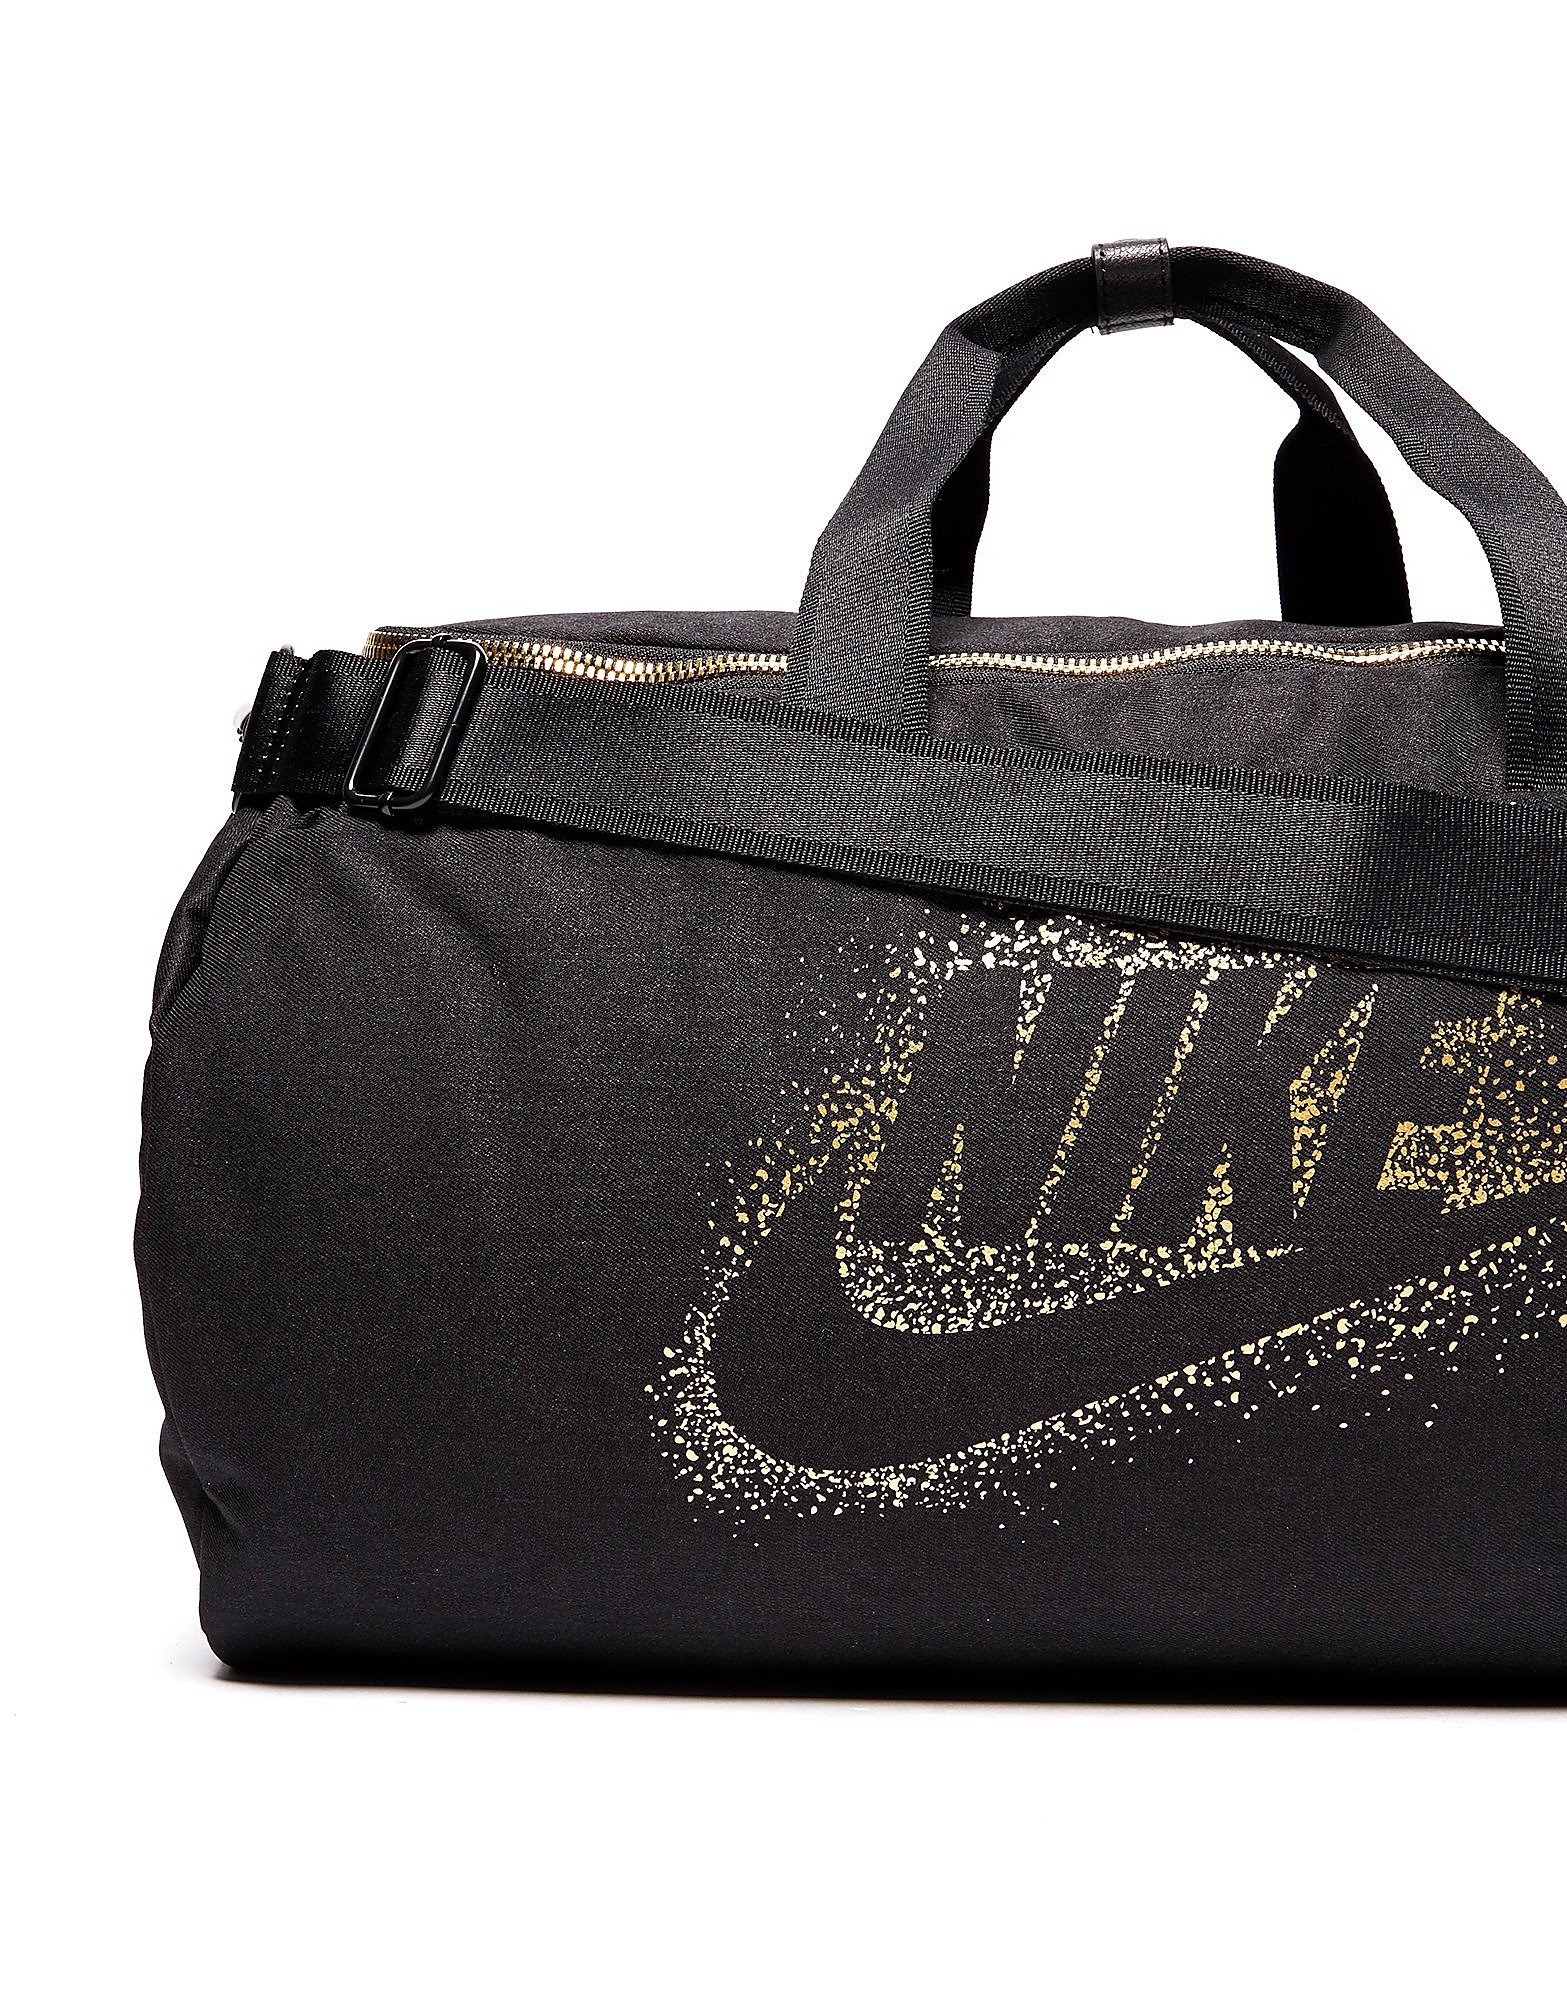 Nike Met Duffle Bag